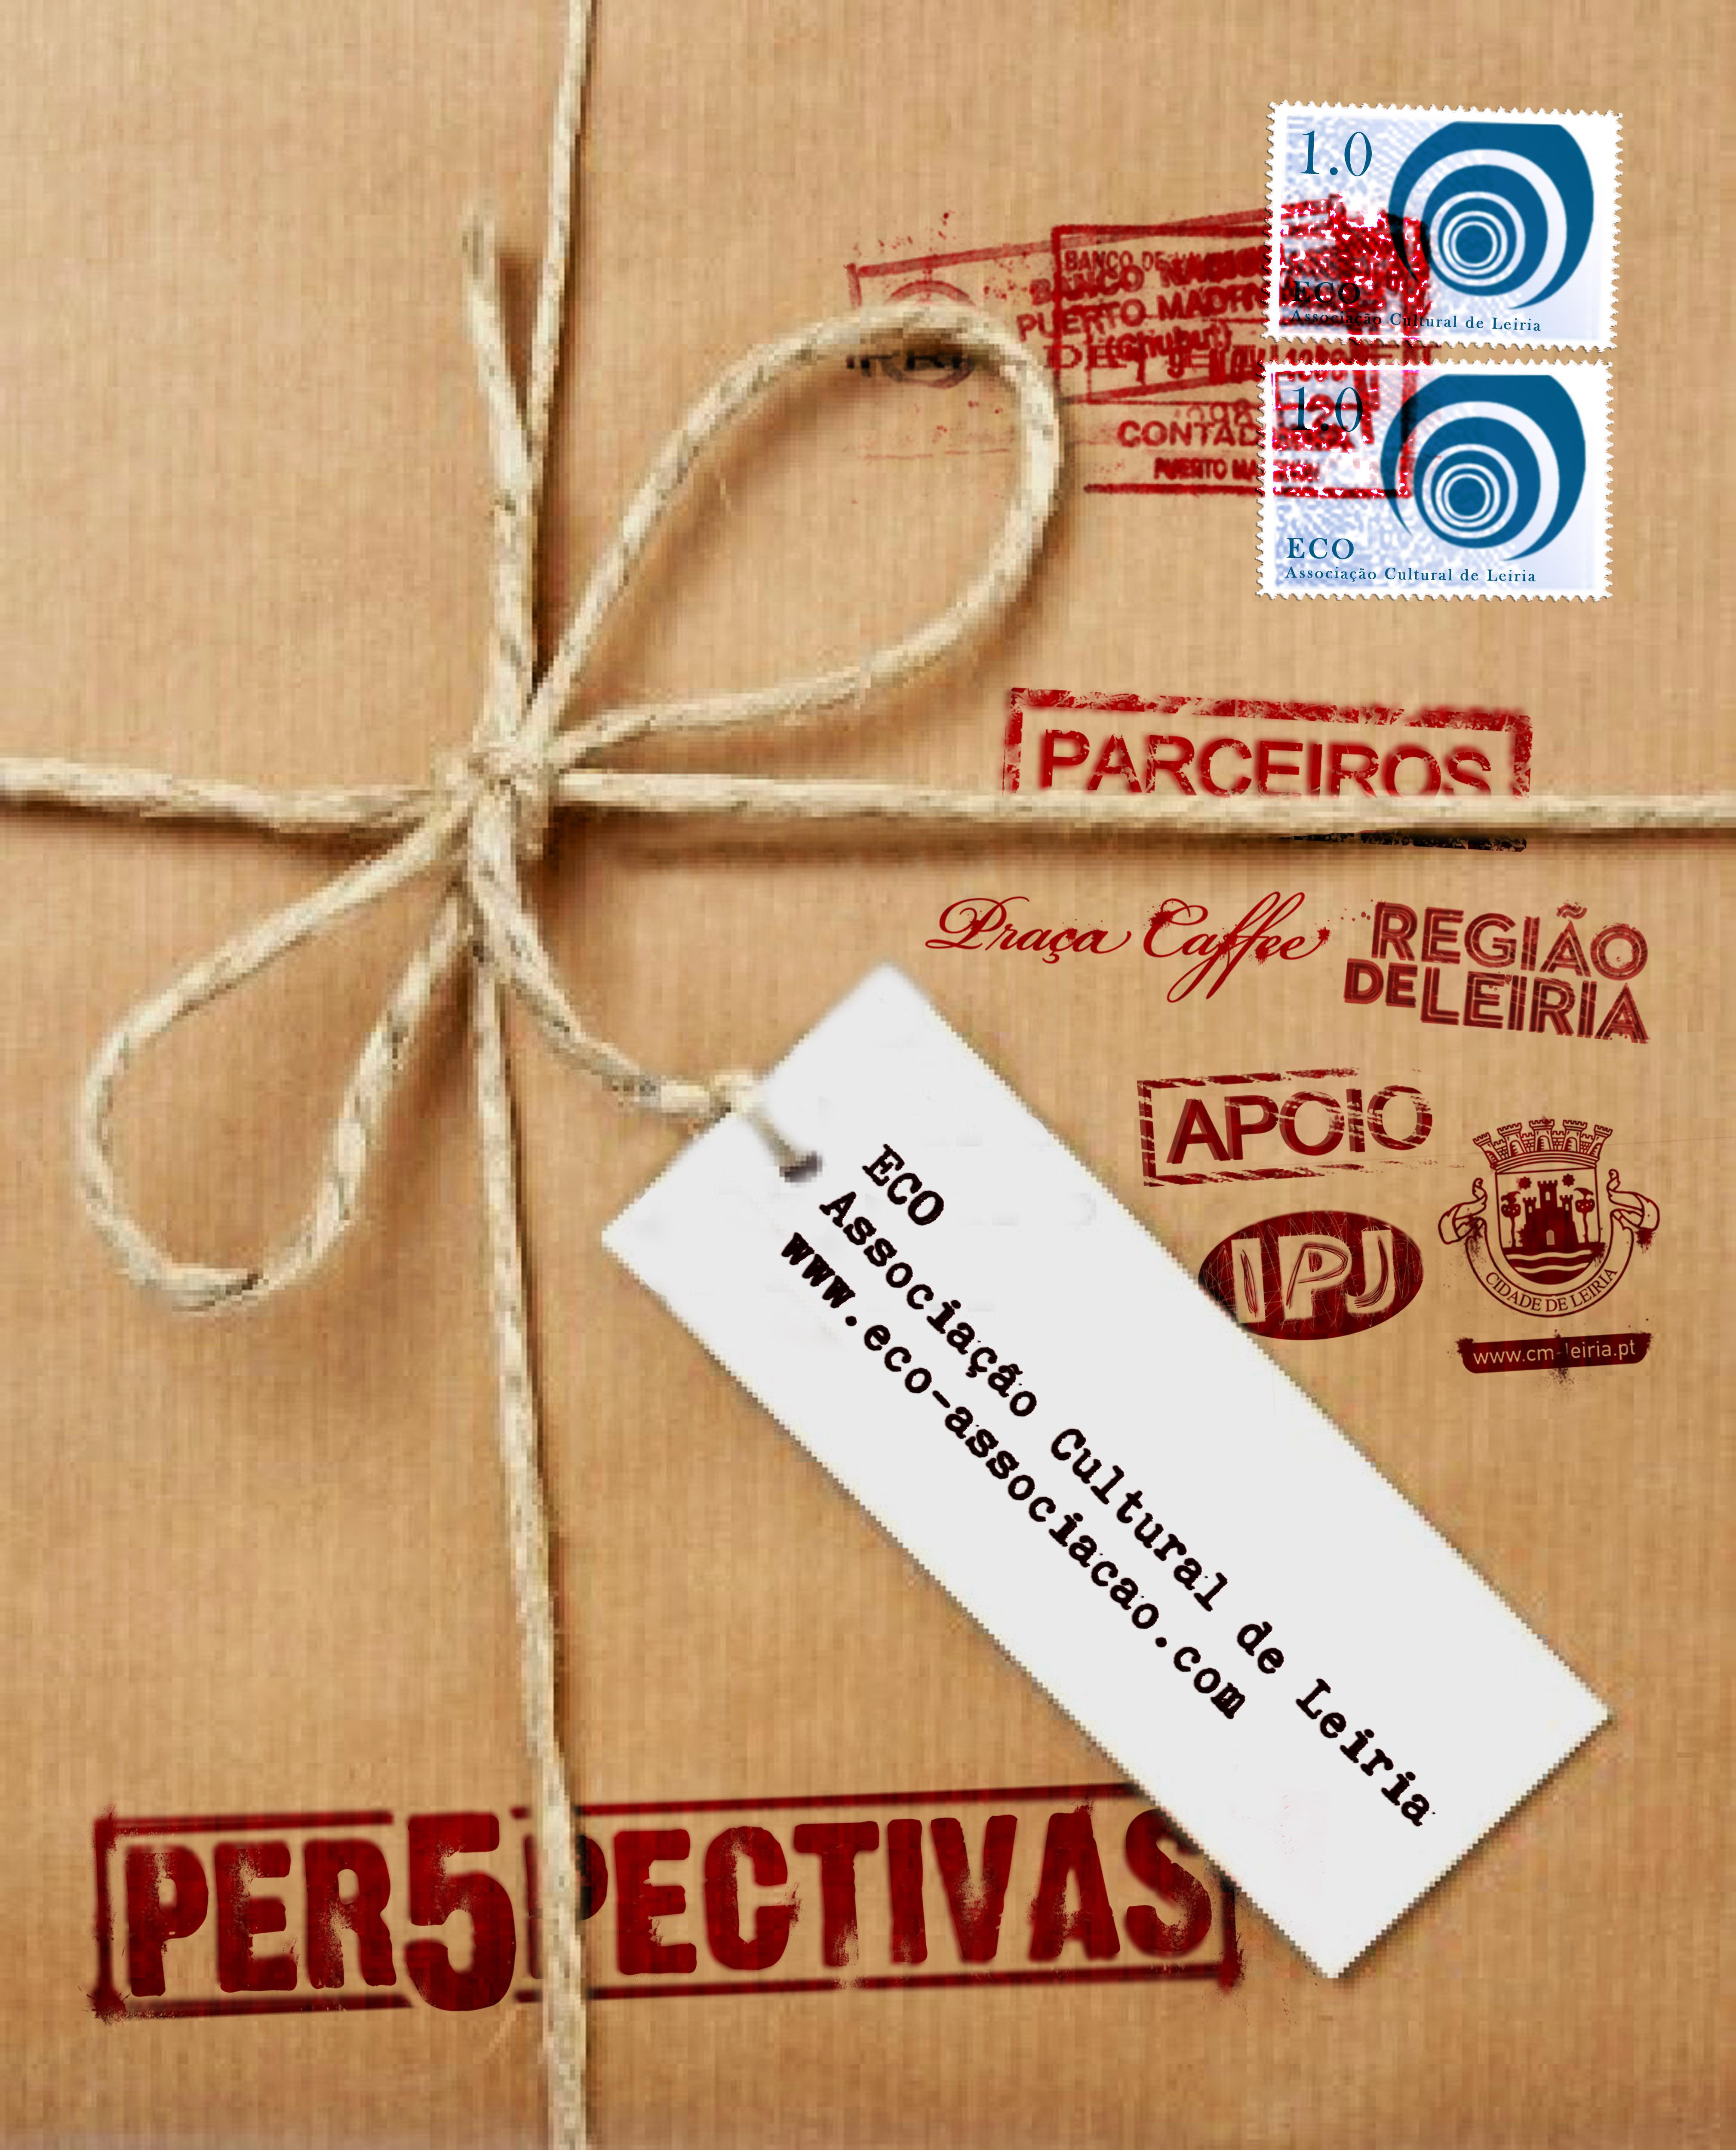 Per5pectivas_Promo